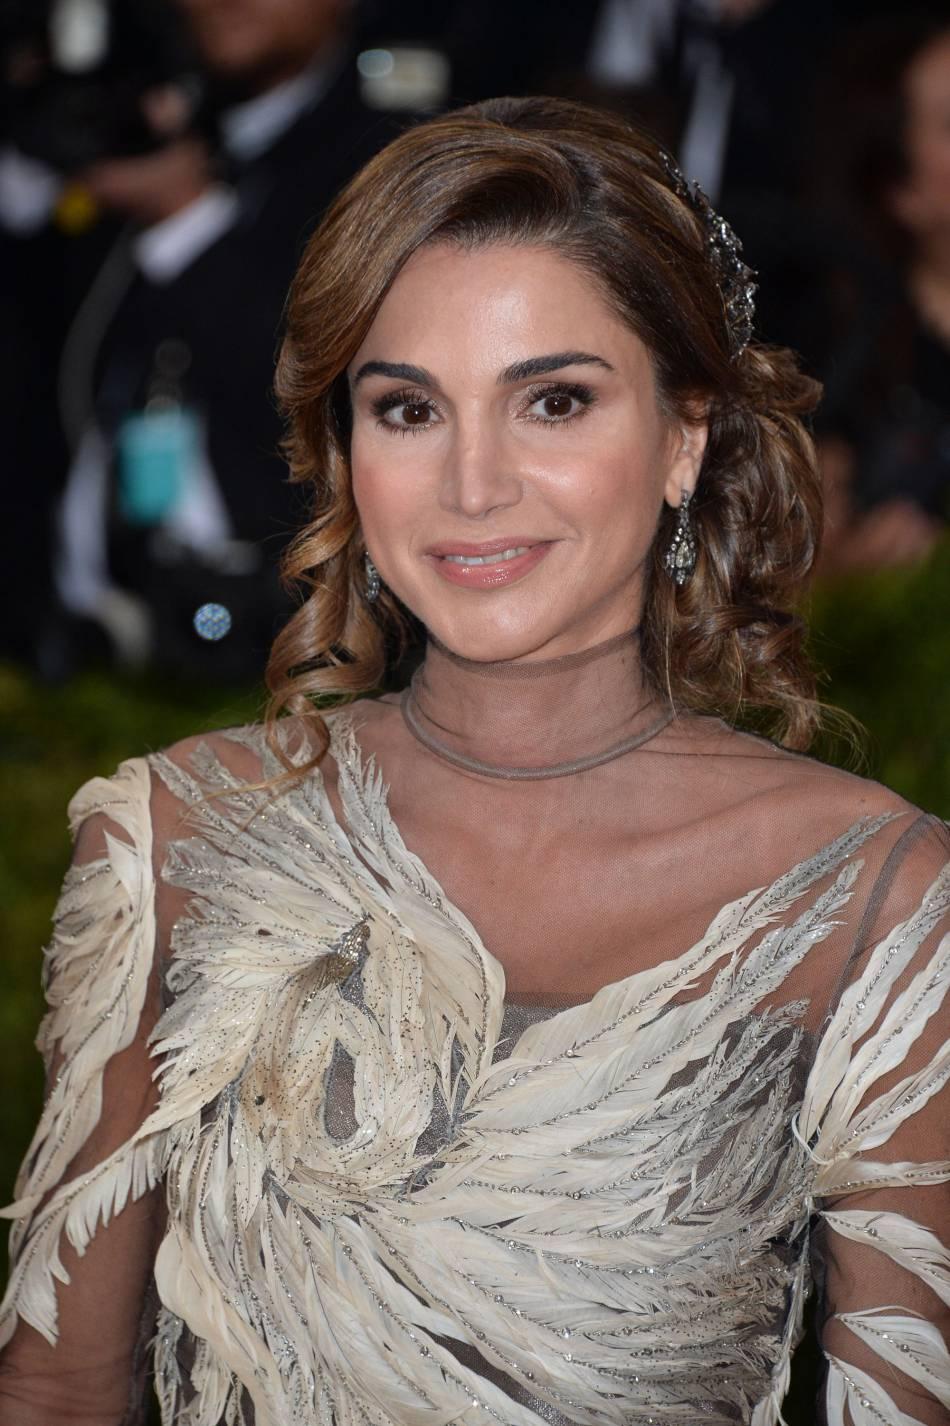 Rania de Jordanie se contente de sublimer sa carnation naturelle.